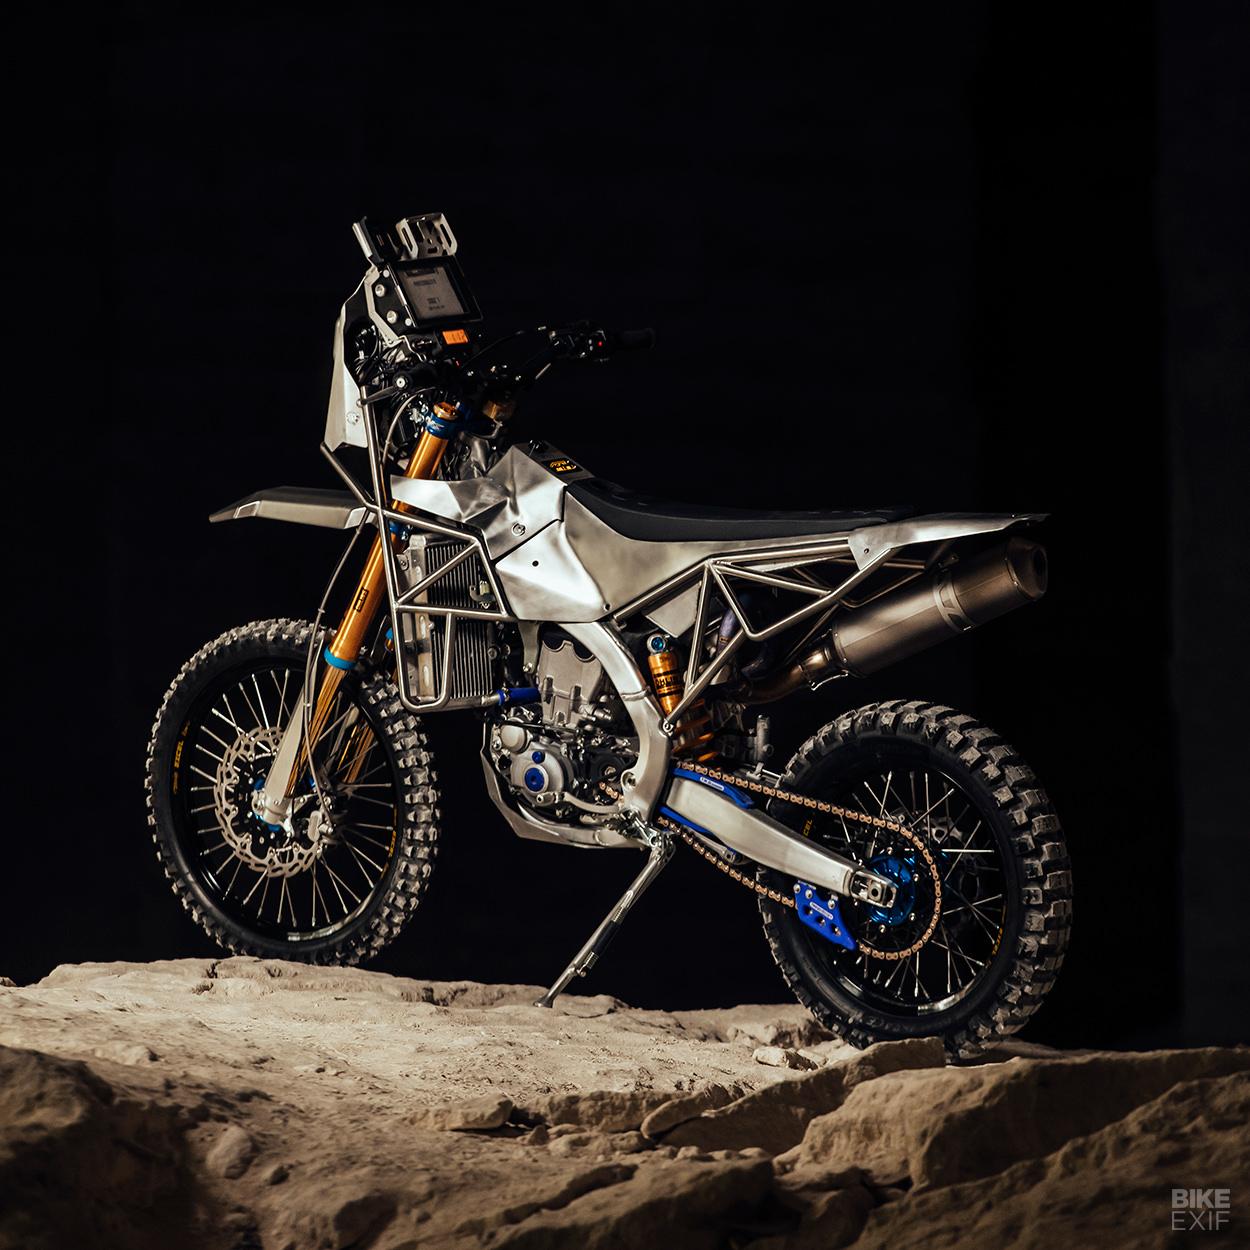 Yamaha WR450F rally raid motorcycle by Le Motographe